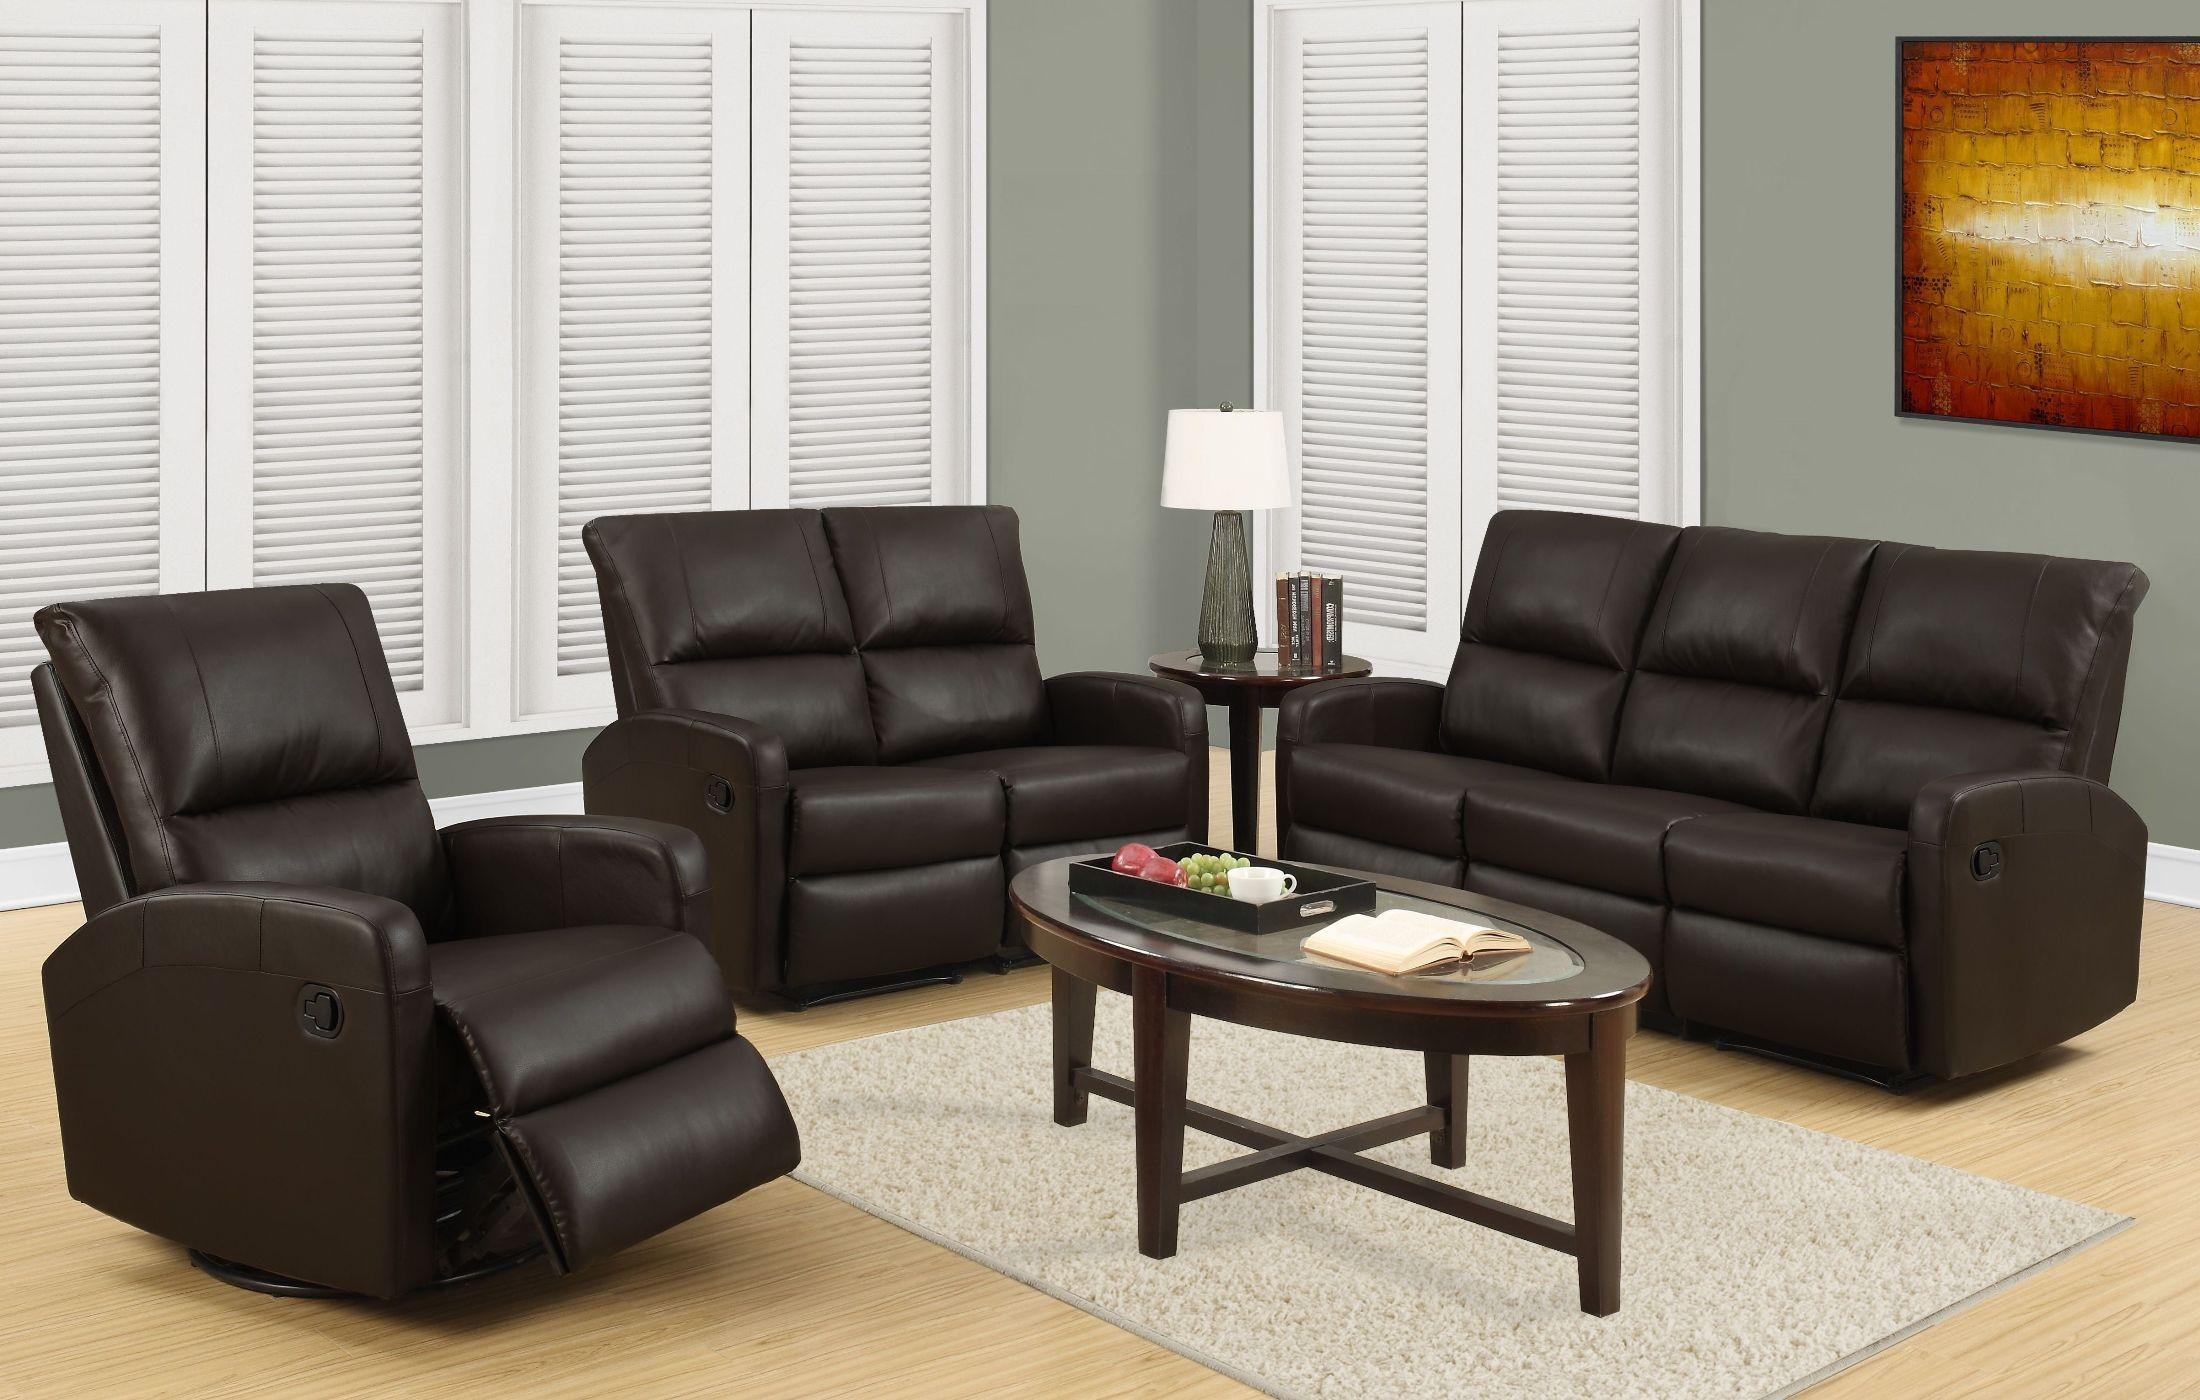 Living Room Furniture: 84BR-3 Dark Brown Bonded Leather Reclining Living Room Set